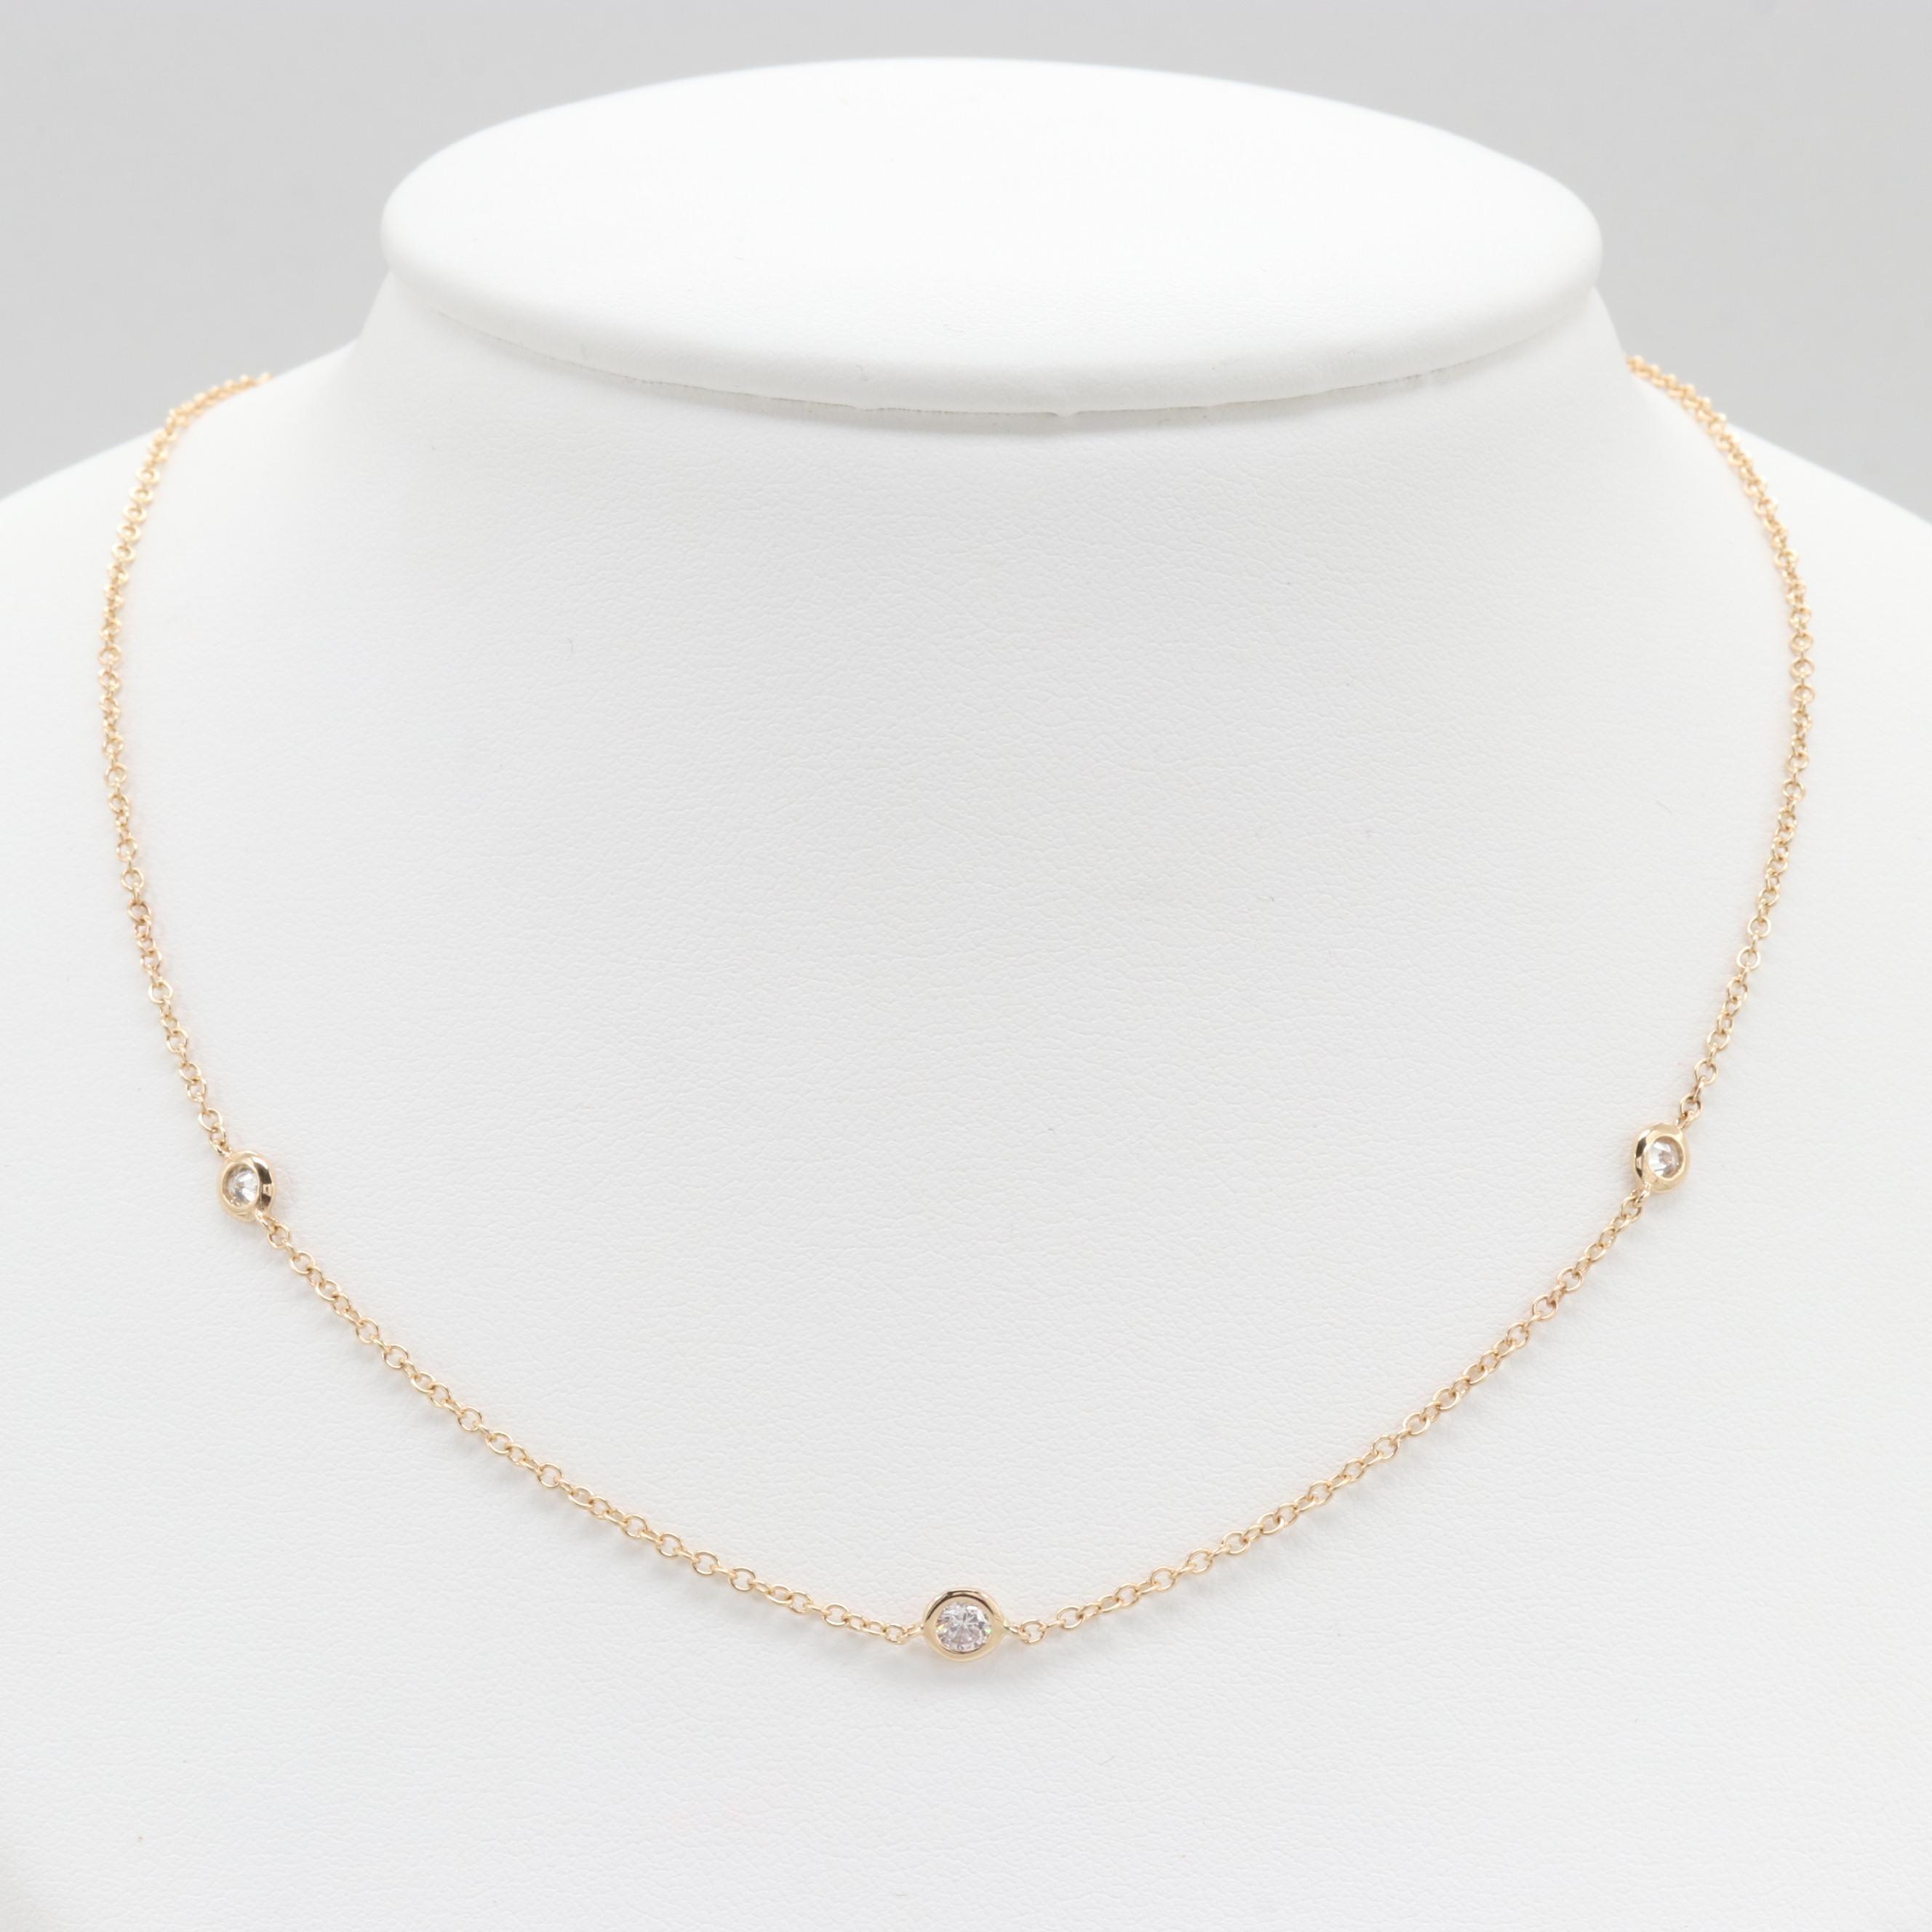 14K Yellow Gold Diamond Station Necklace